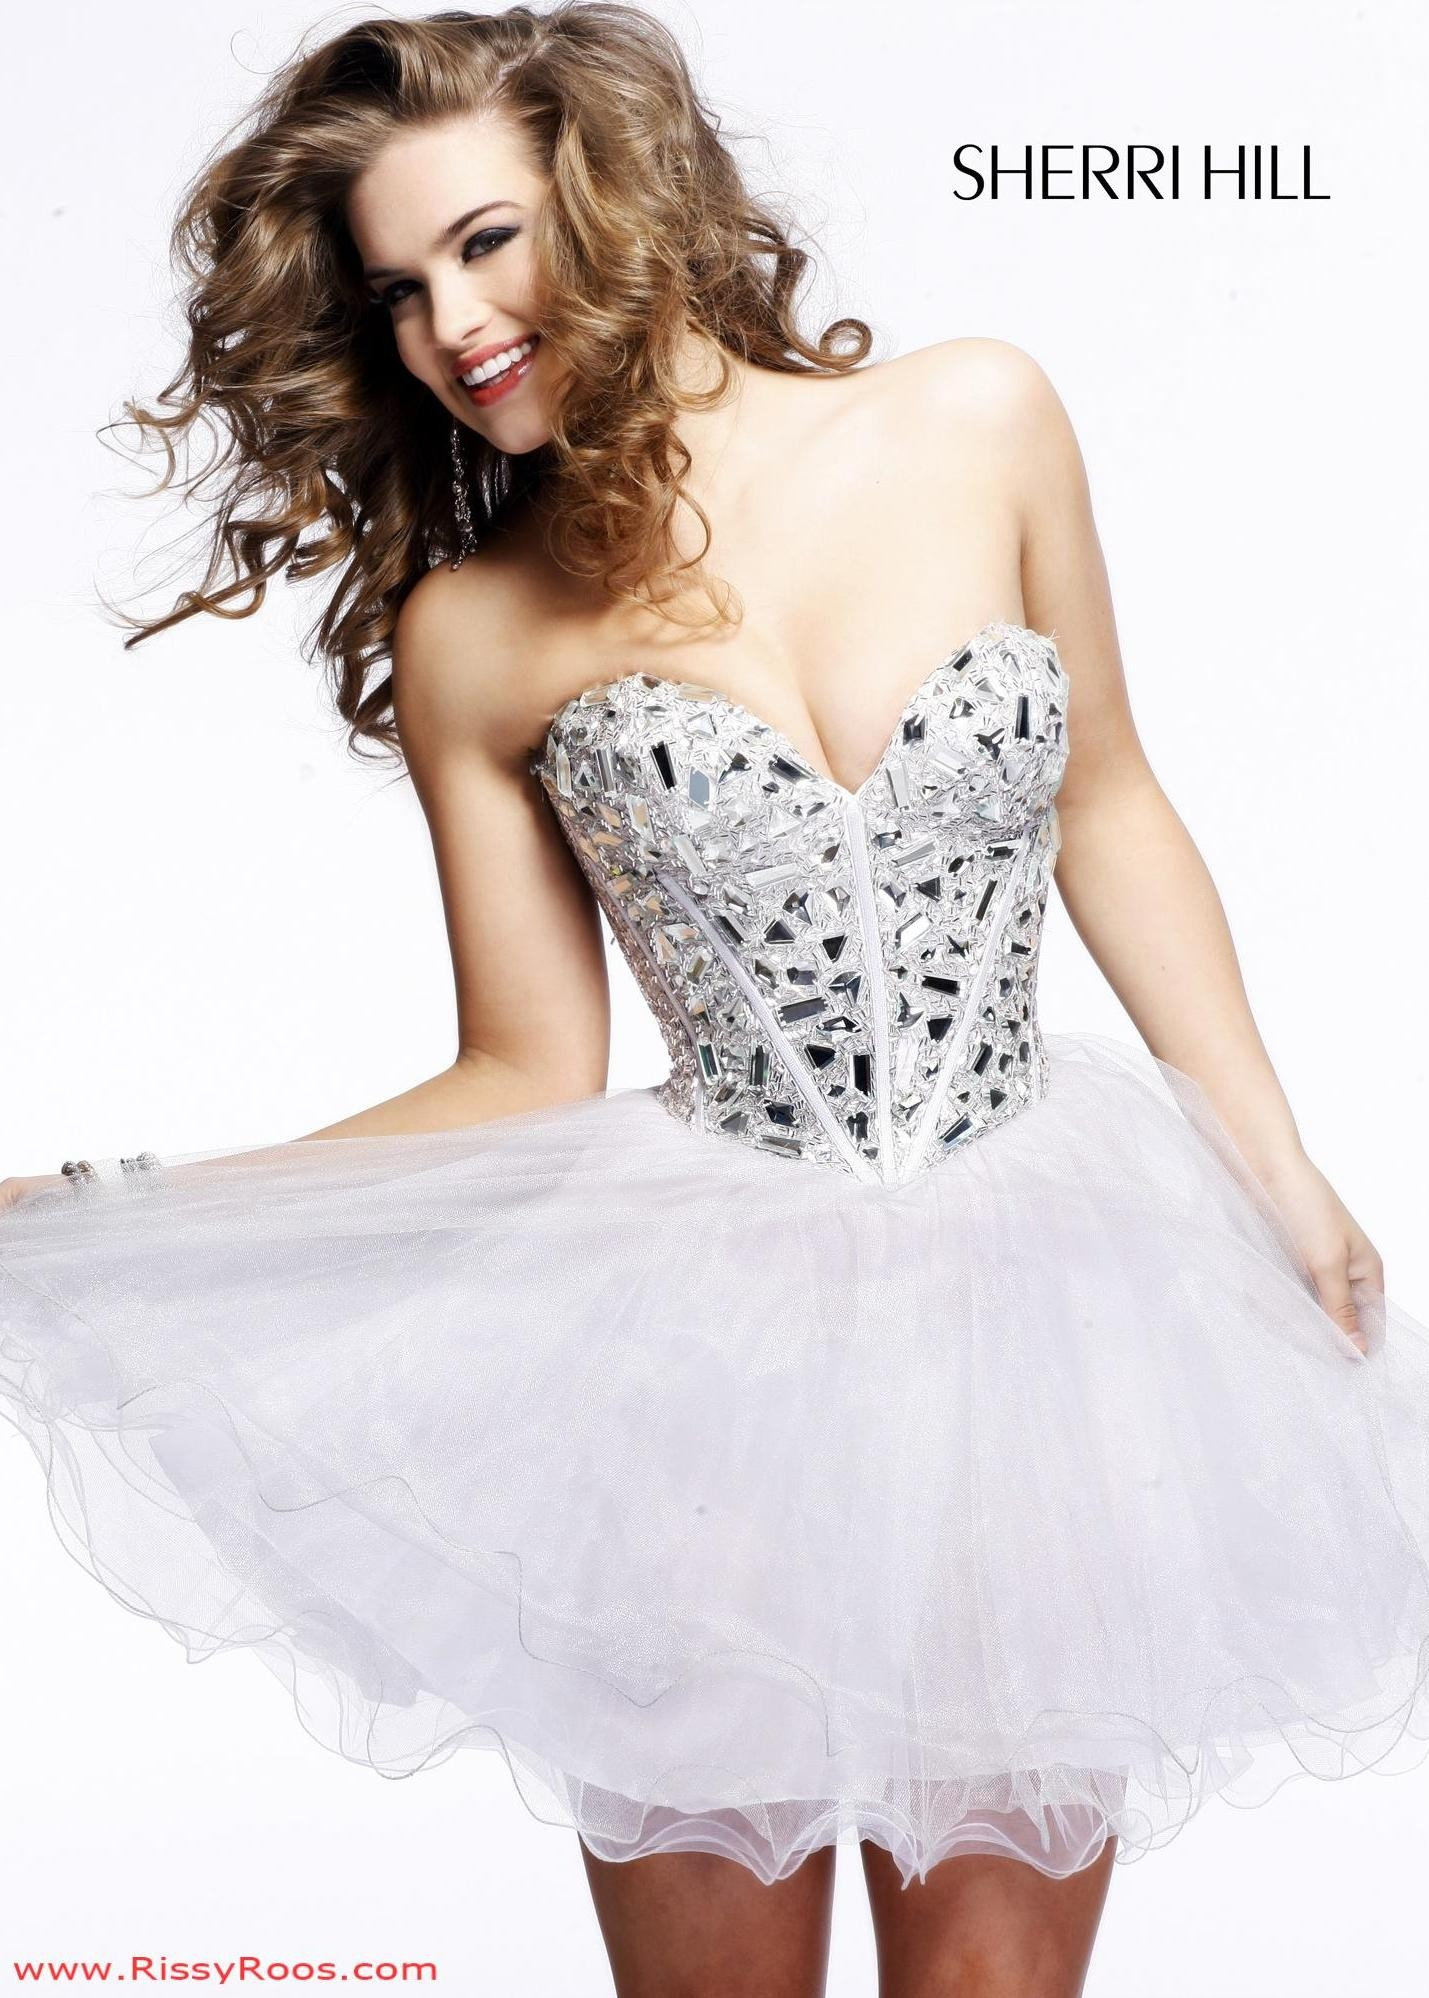 White dress cocktail party - Sherri Hill 1403 White Sweetheart Party Dress Cocktail Dresses Rissyroos Com